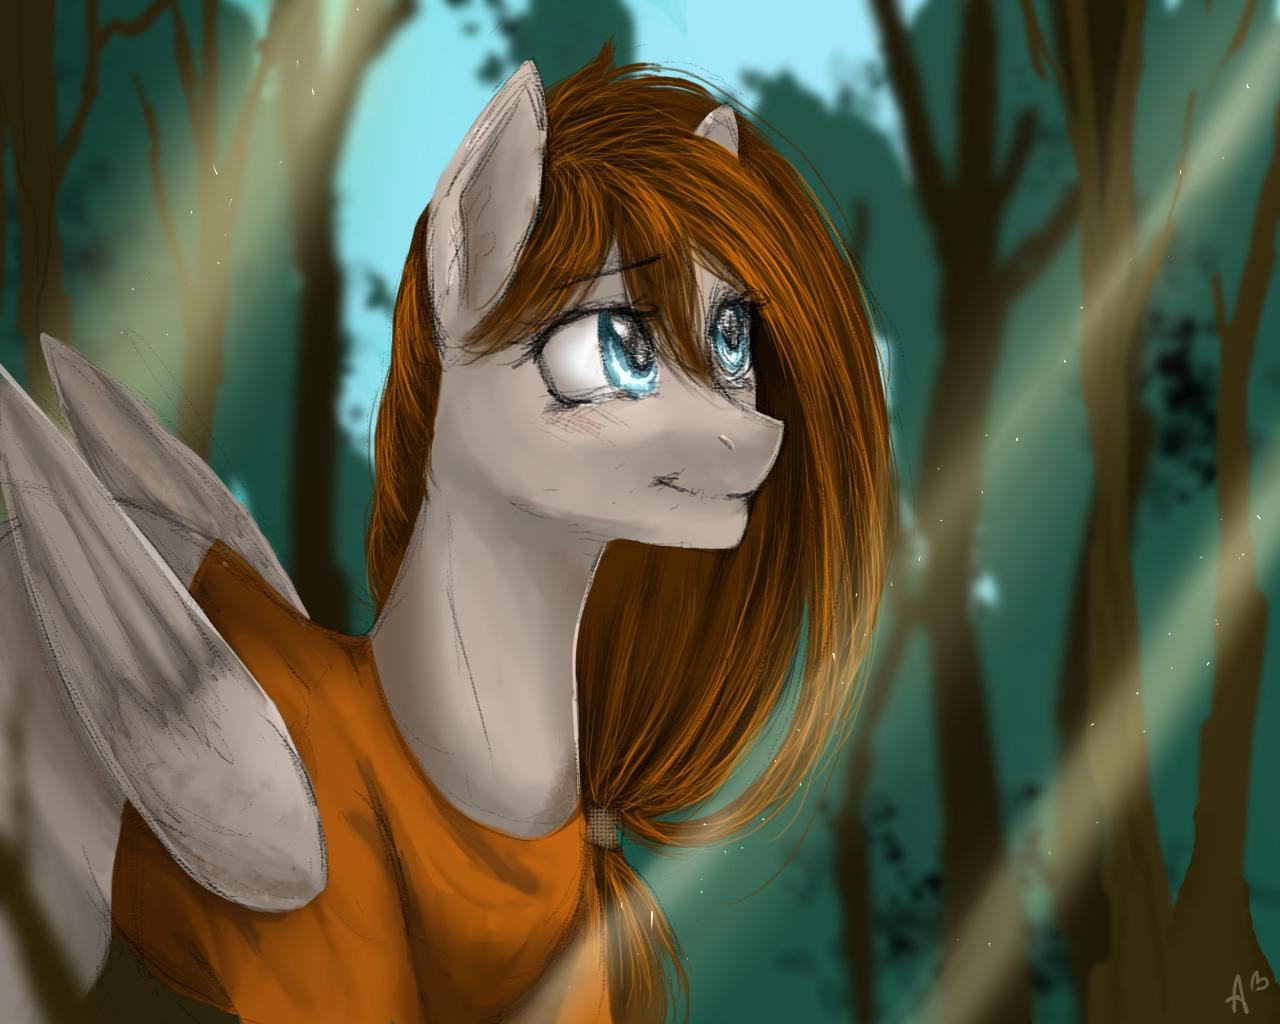 Walk in the forest by AliceSmitt31